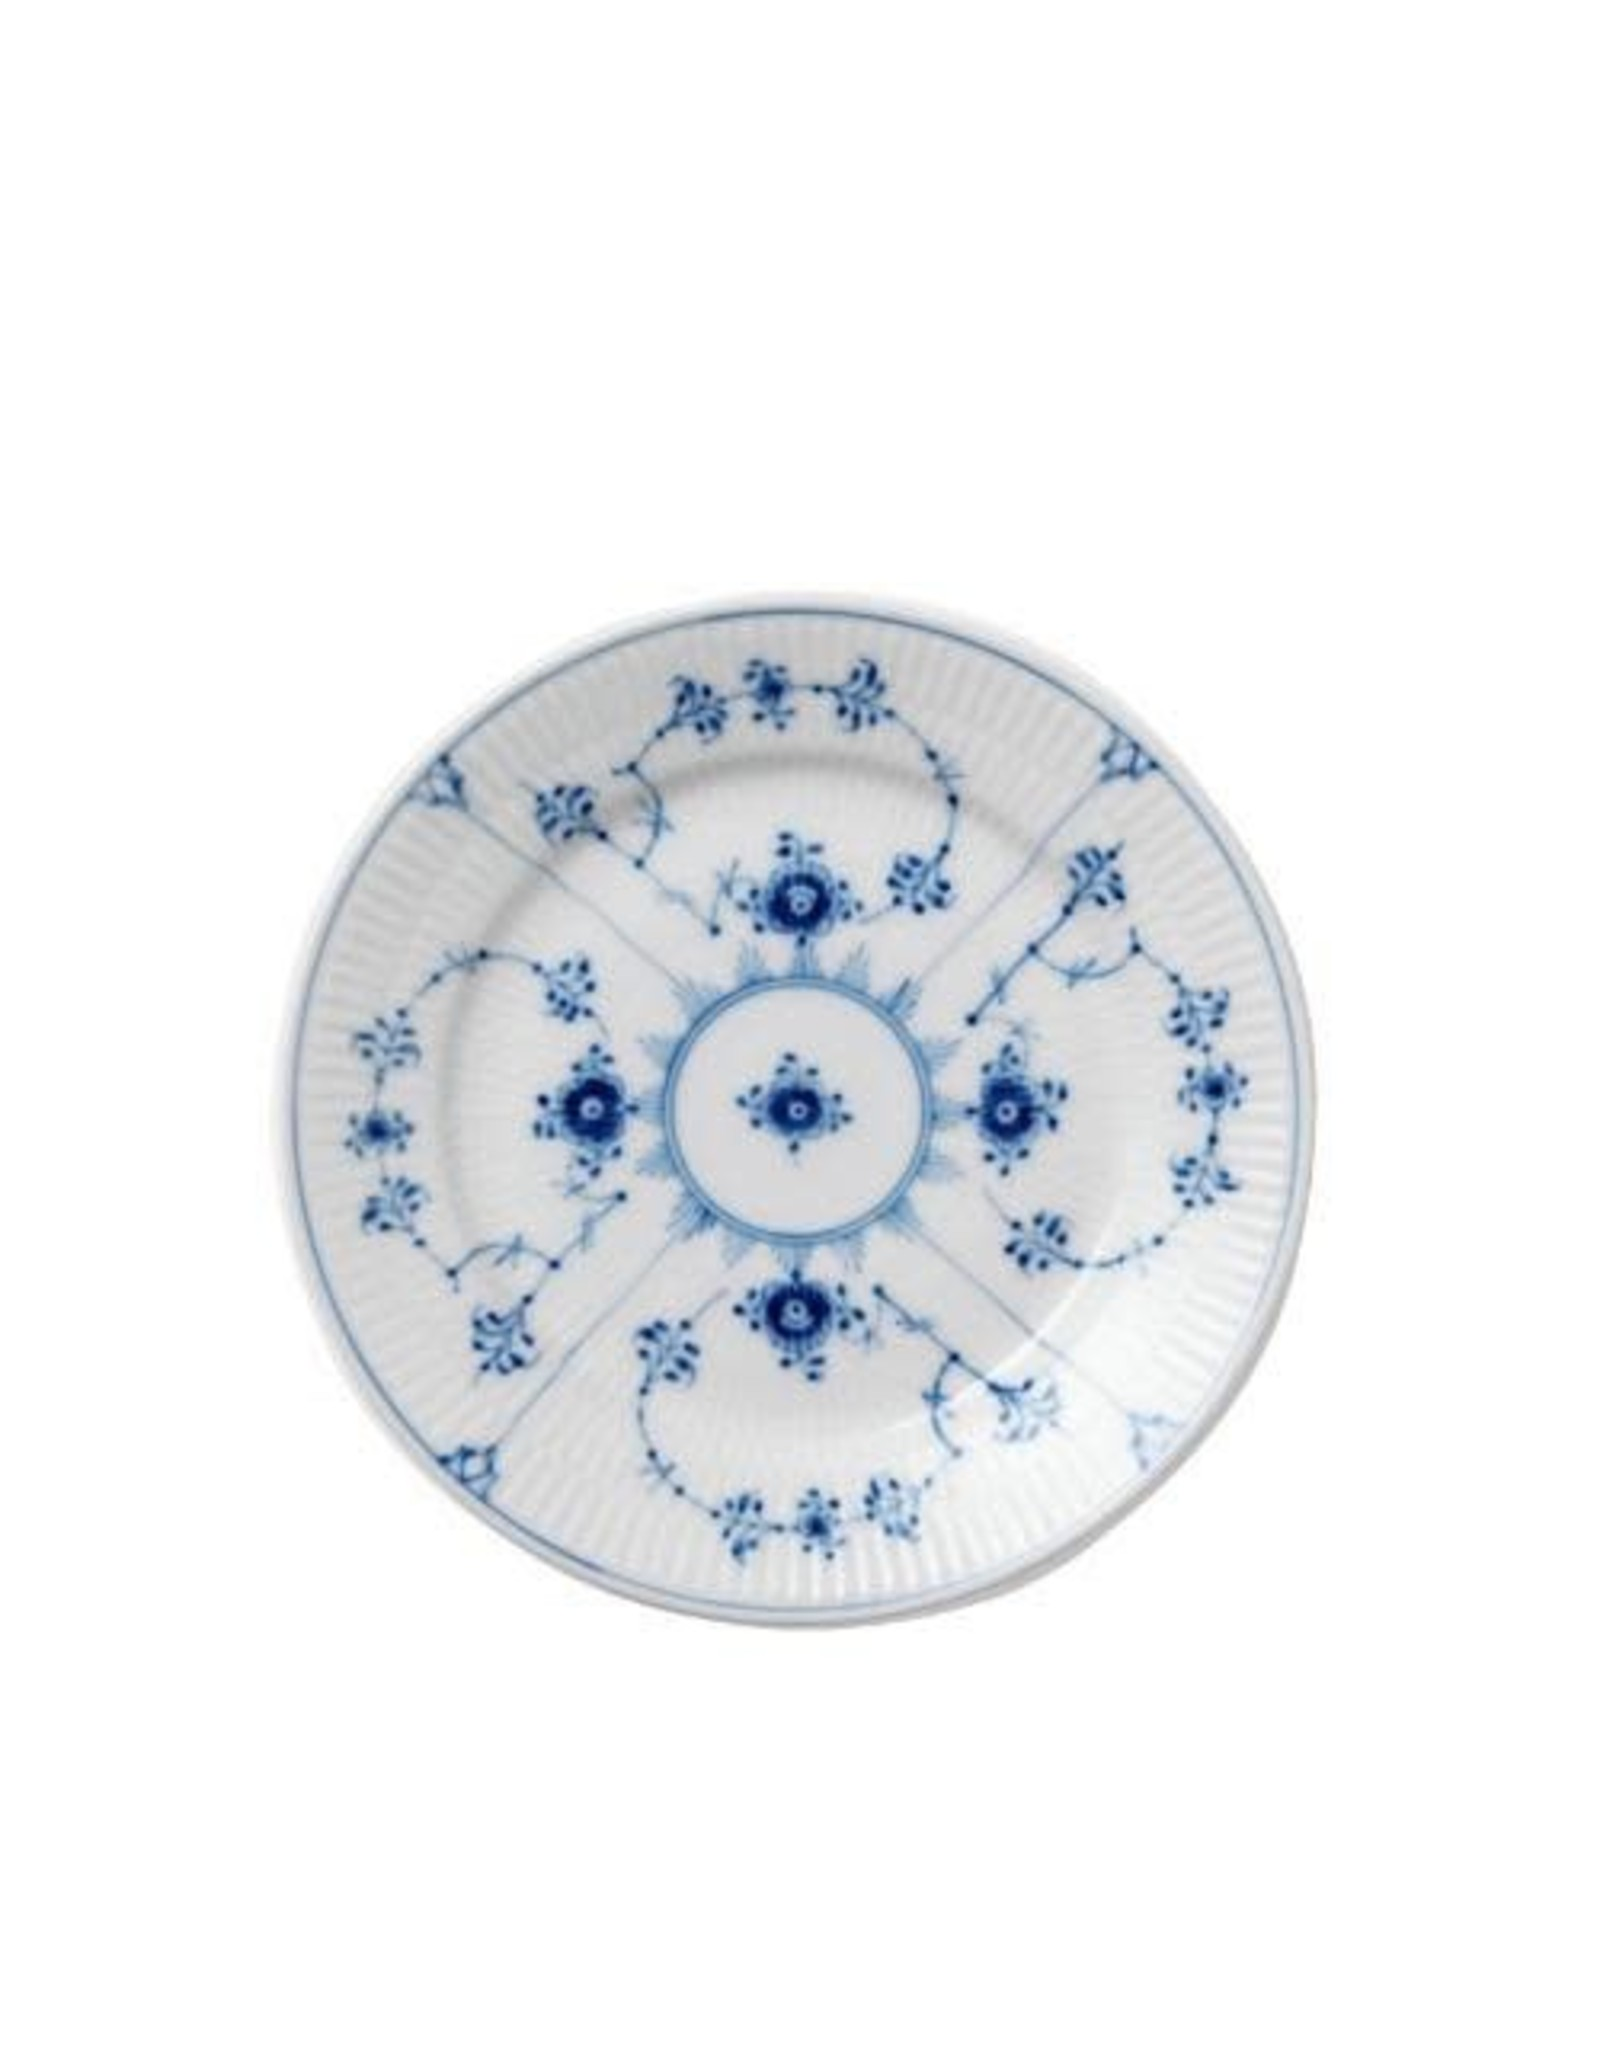 ROYAL COPENHAGEN BLUE FLUTED PLAIN TABLEWARE